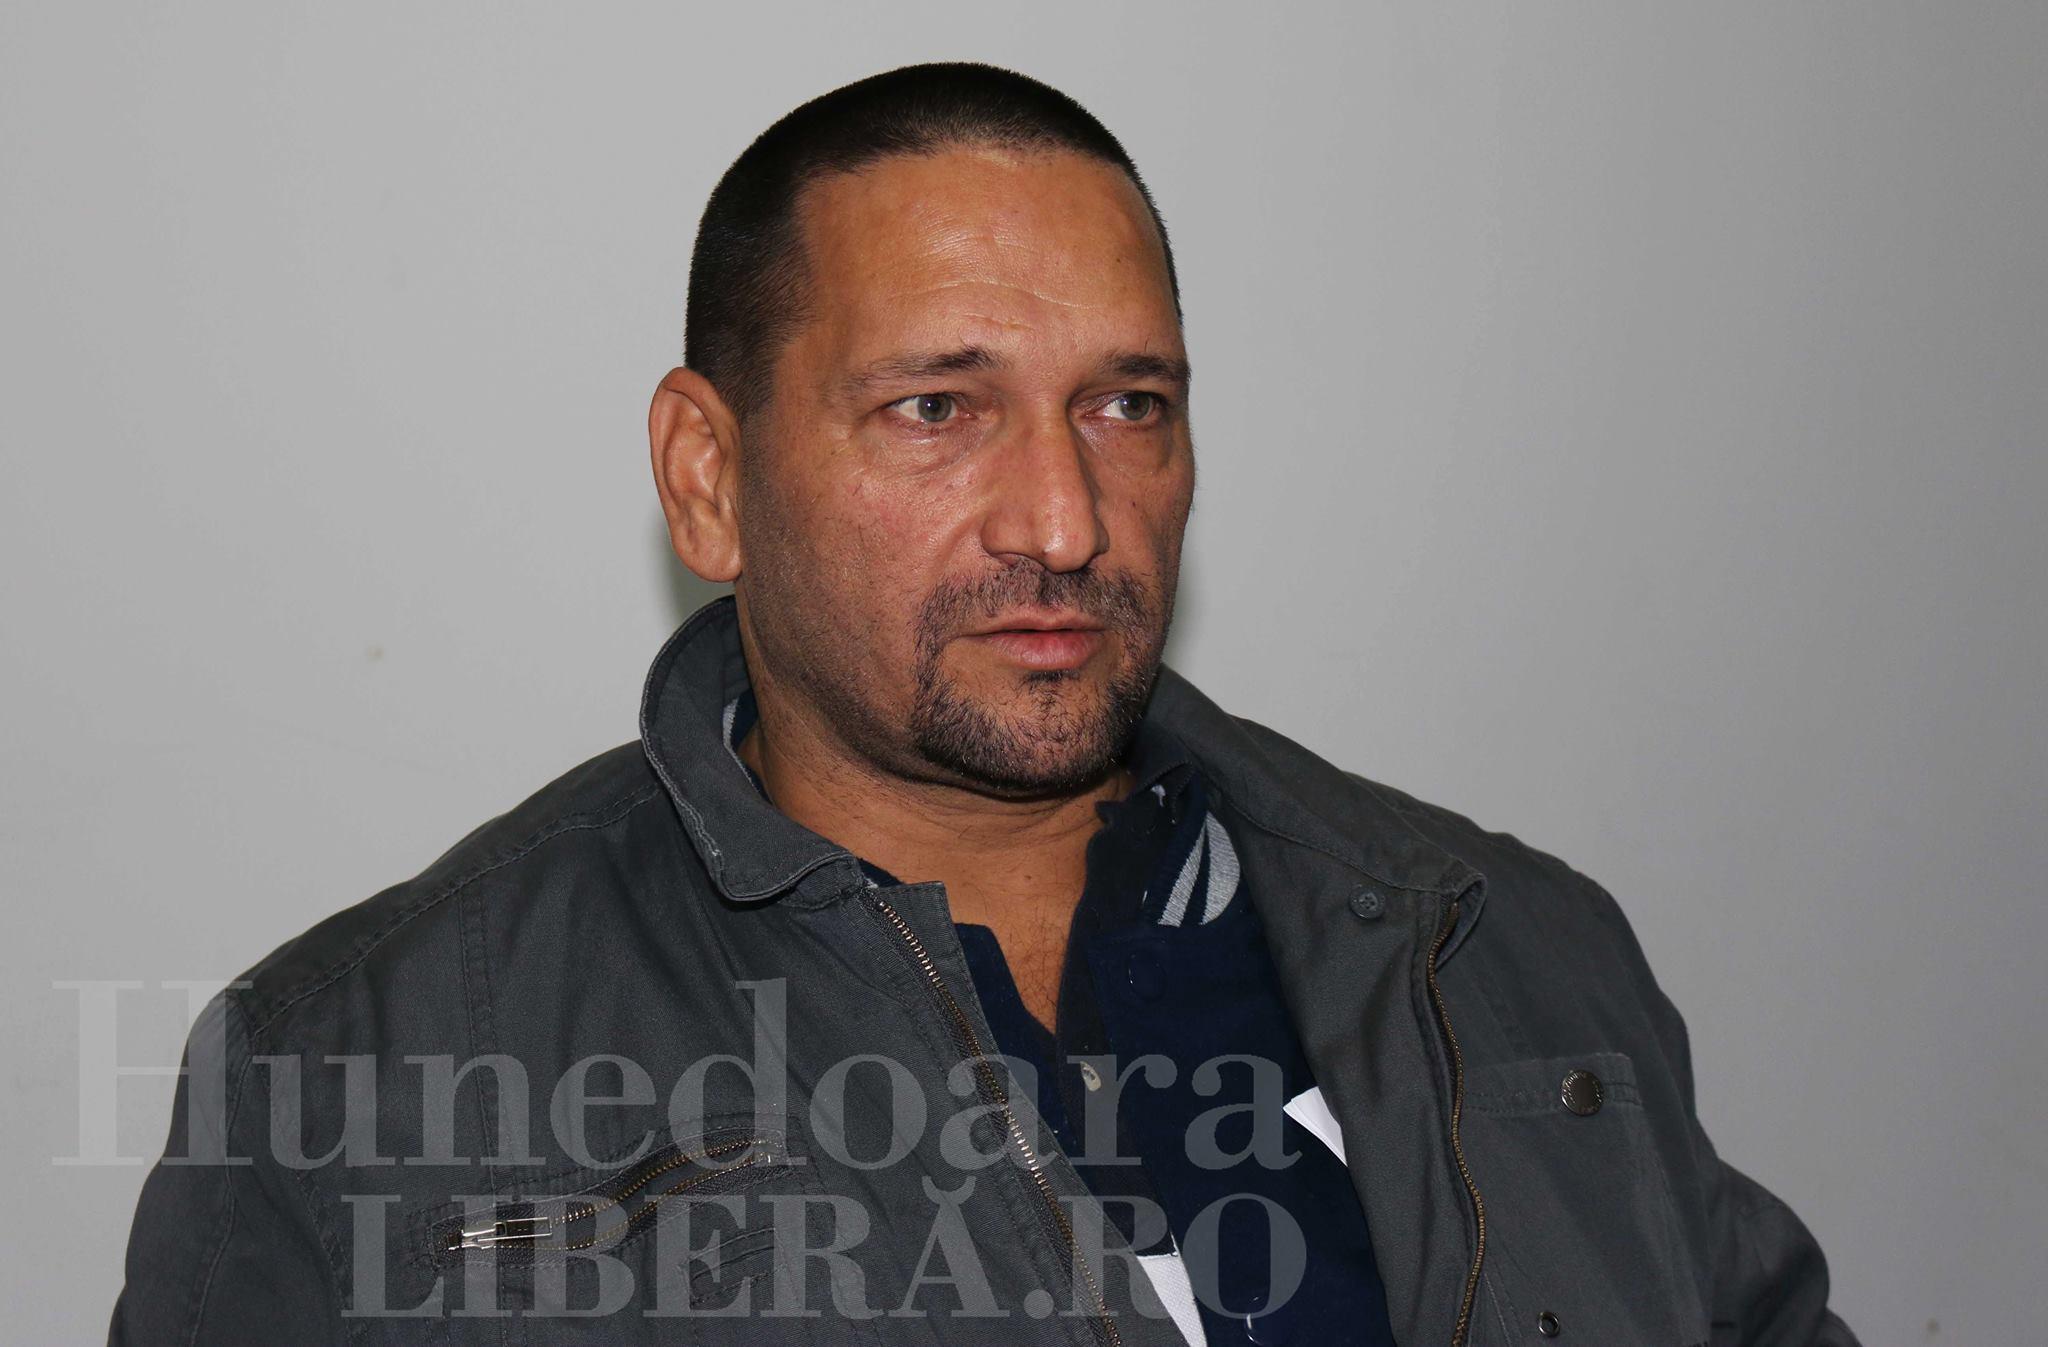 Comisarul-șef Traian Berbeceanu a fost achitat de toate ...  |Traian Berbeceanu